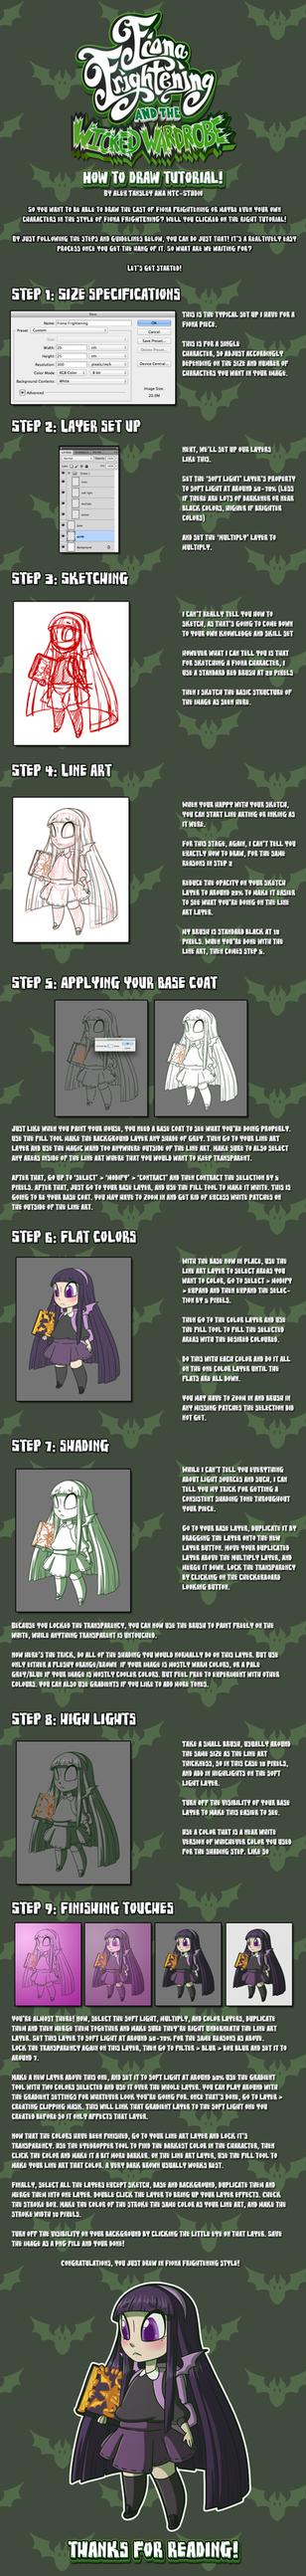 Wicked Wardrobe: Fiona Frightening Style tutotial by DrCrafty